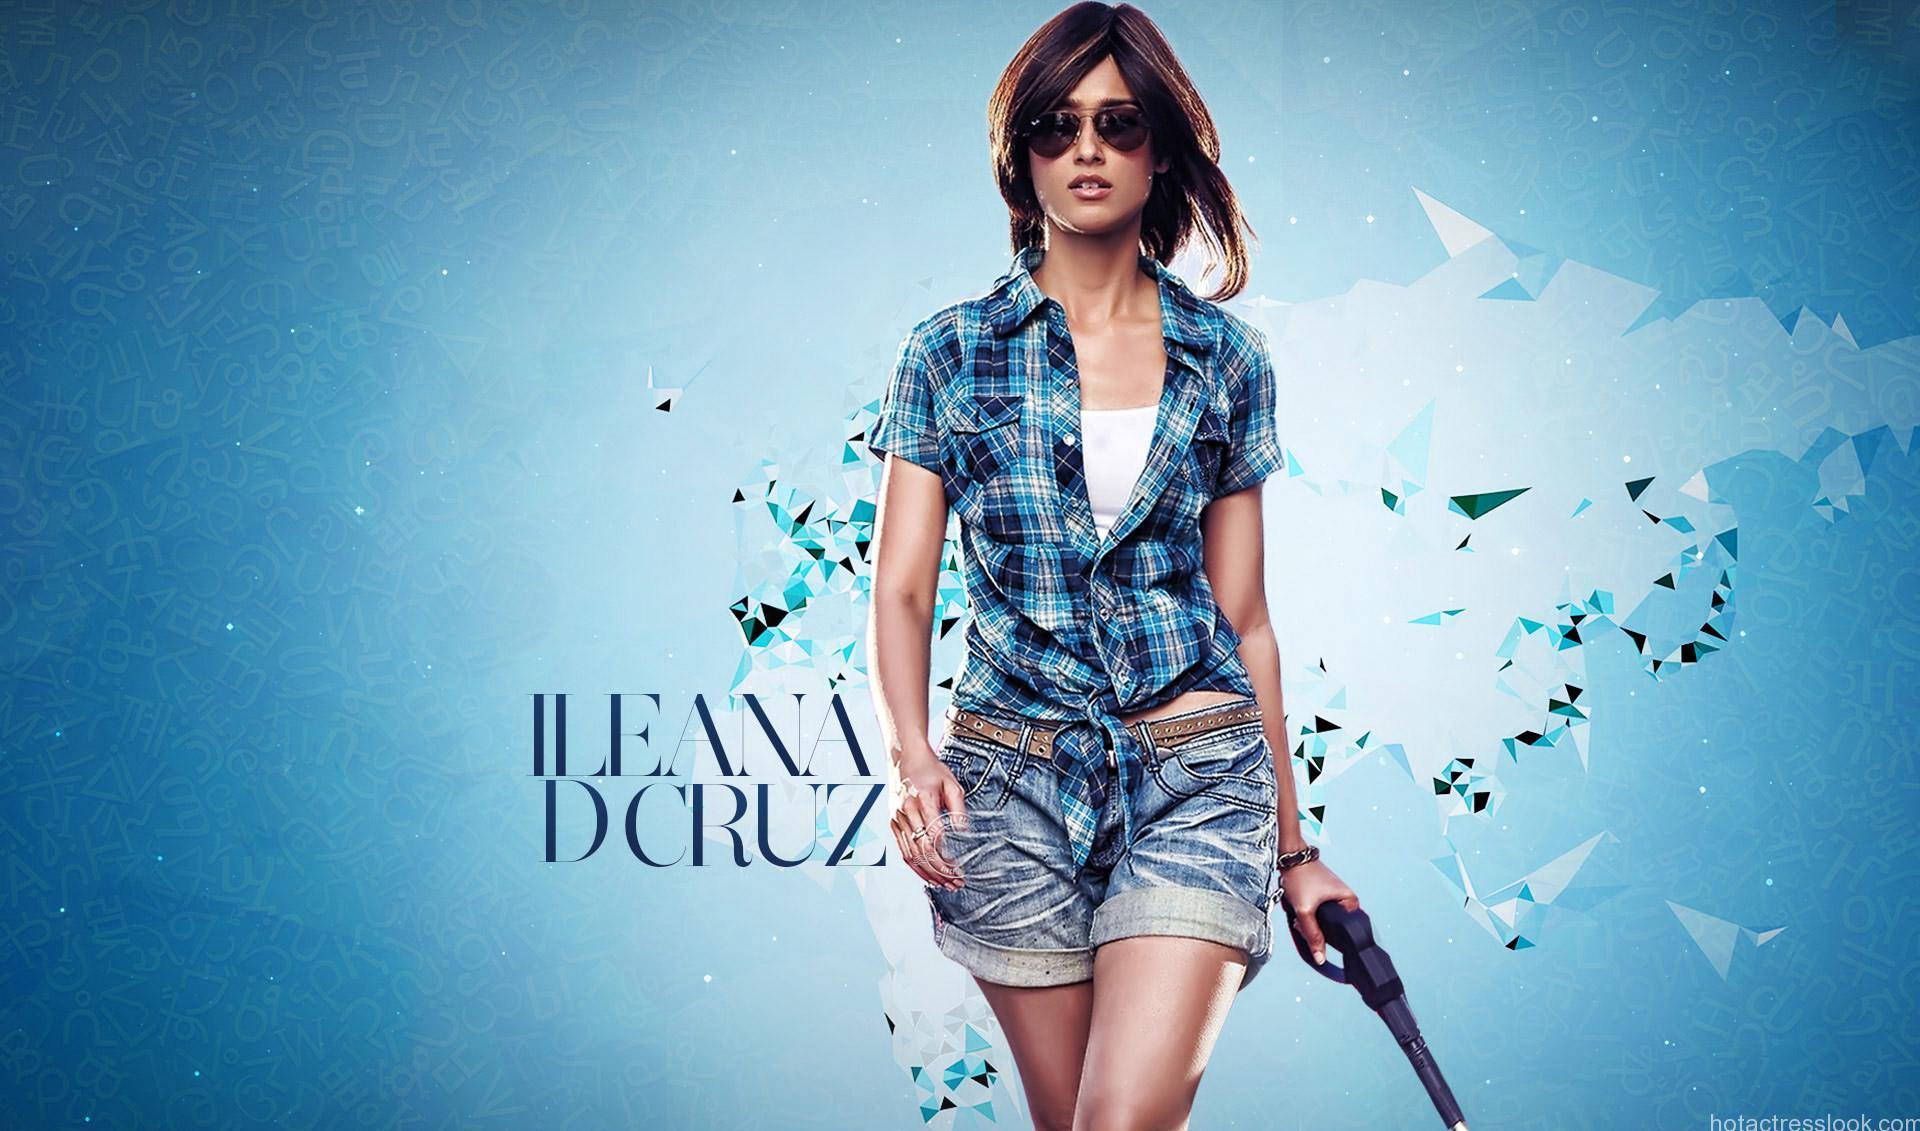 Ileana-D-Cruz-Action-Pose